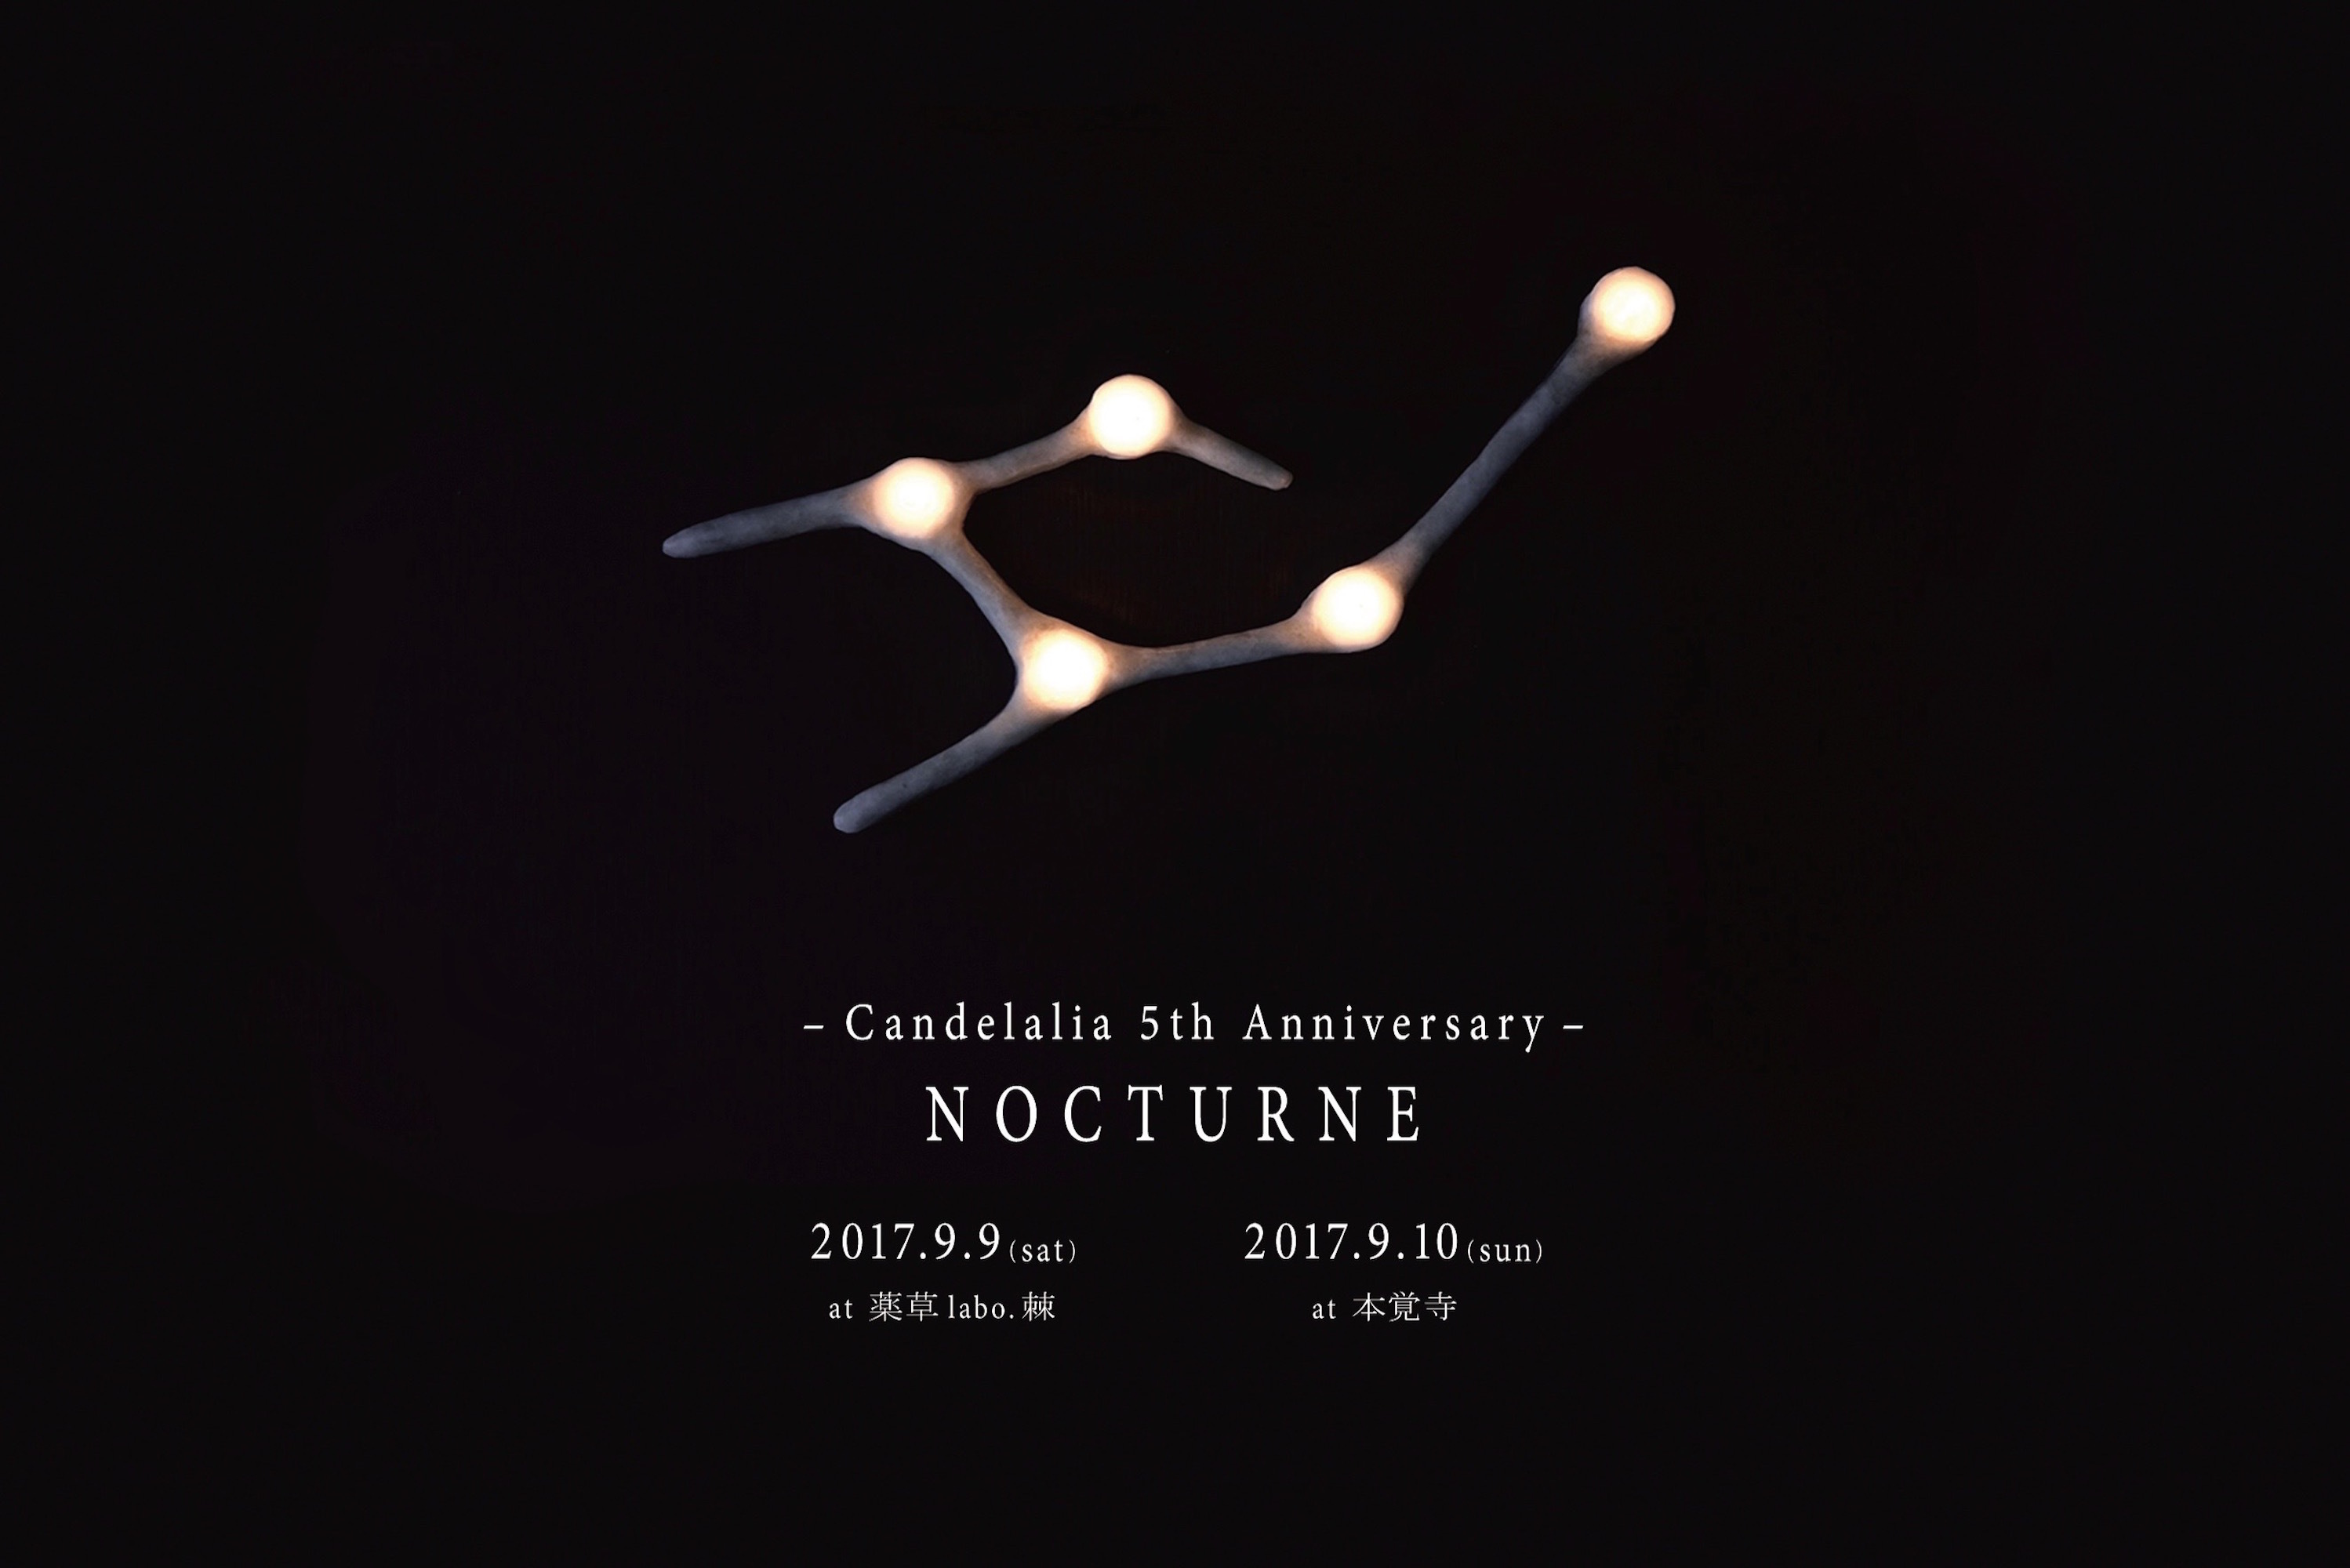 Candelalia 5th Anniversary_b0255623_01070714.jpg